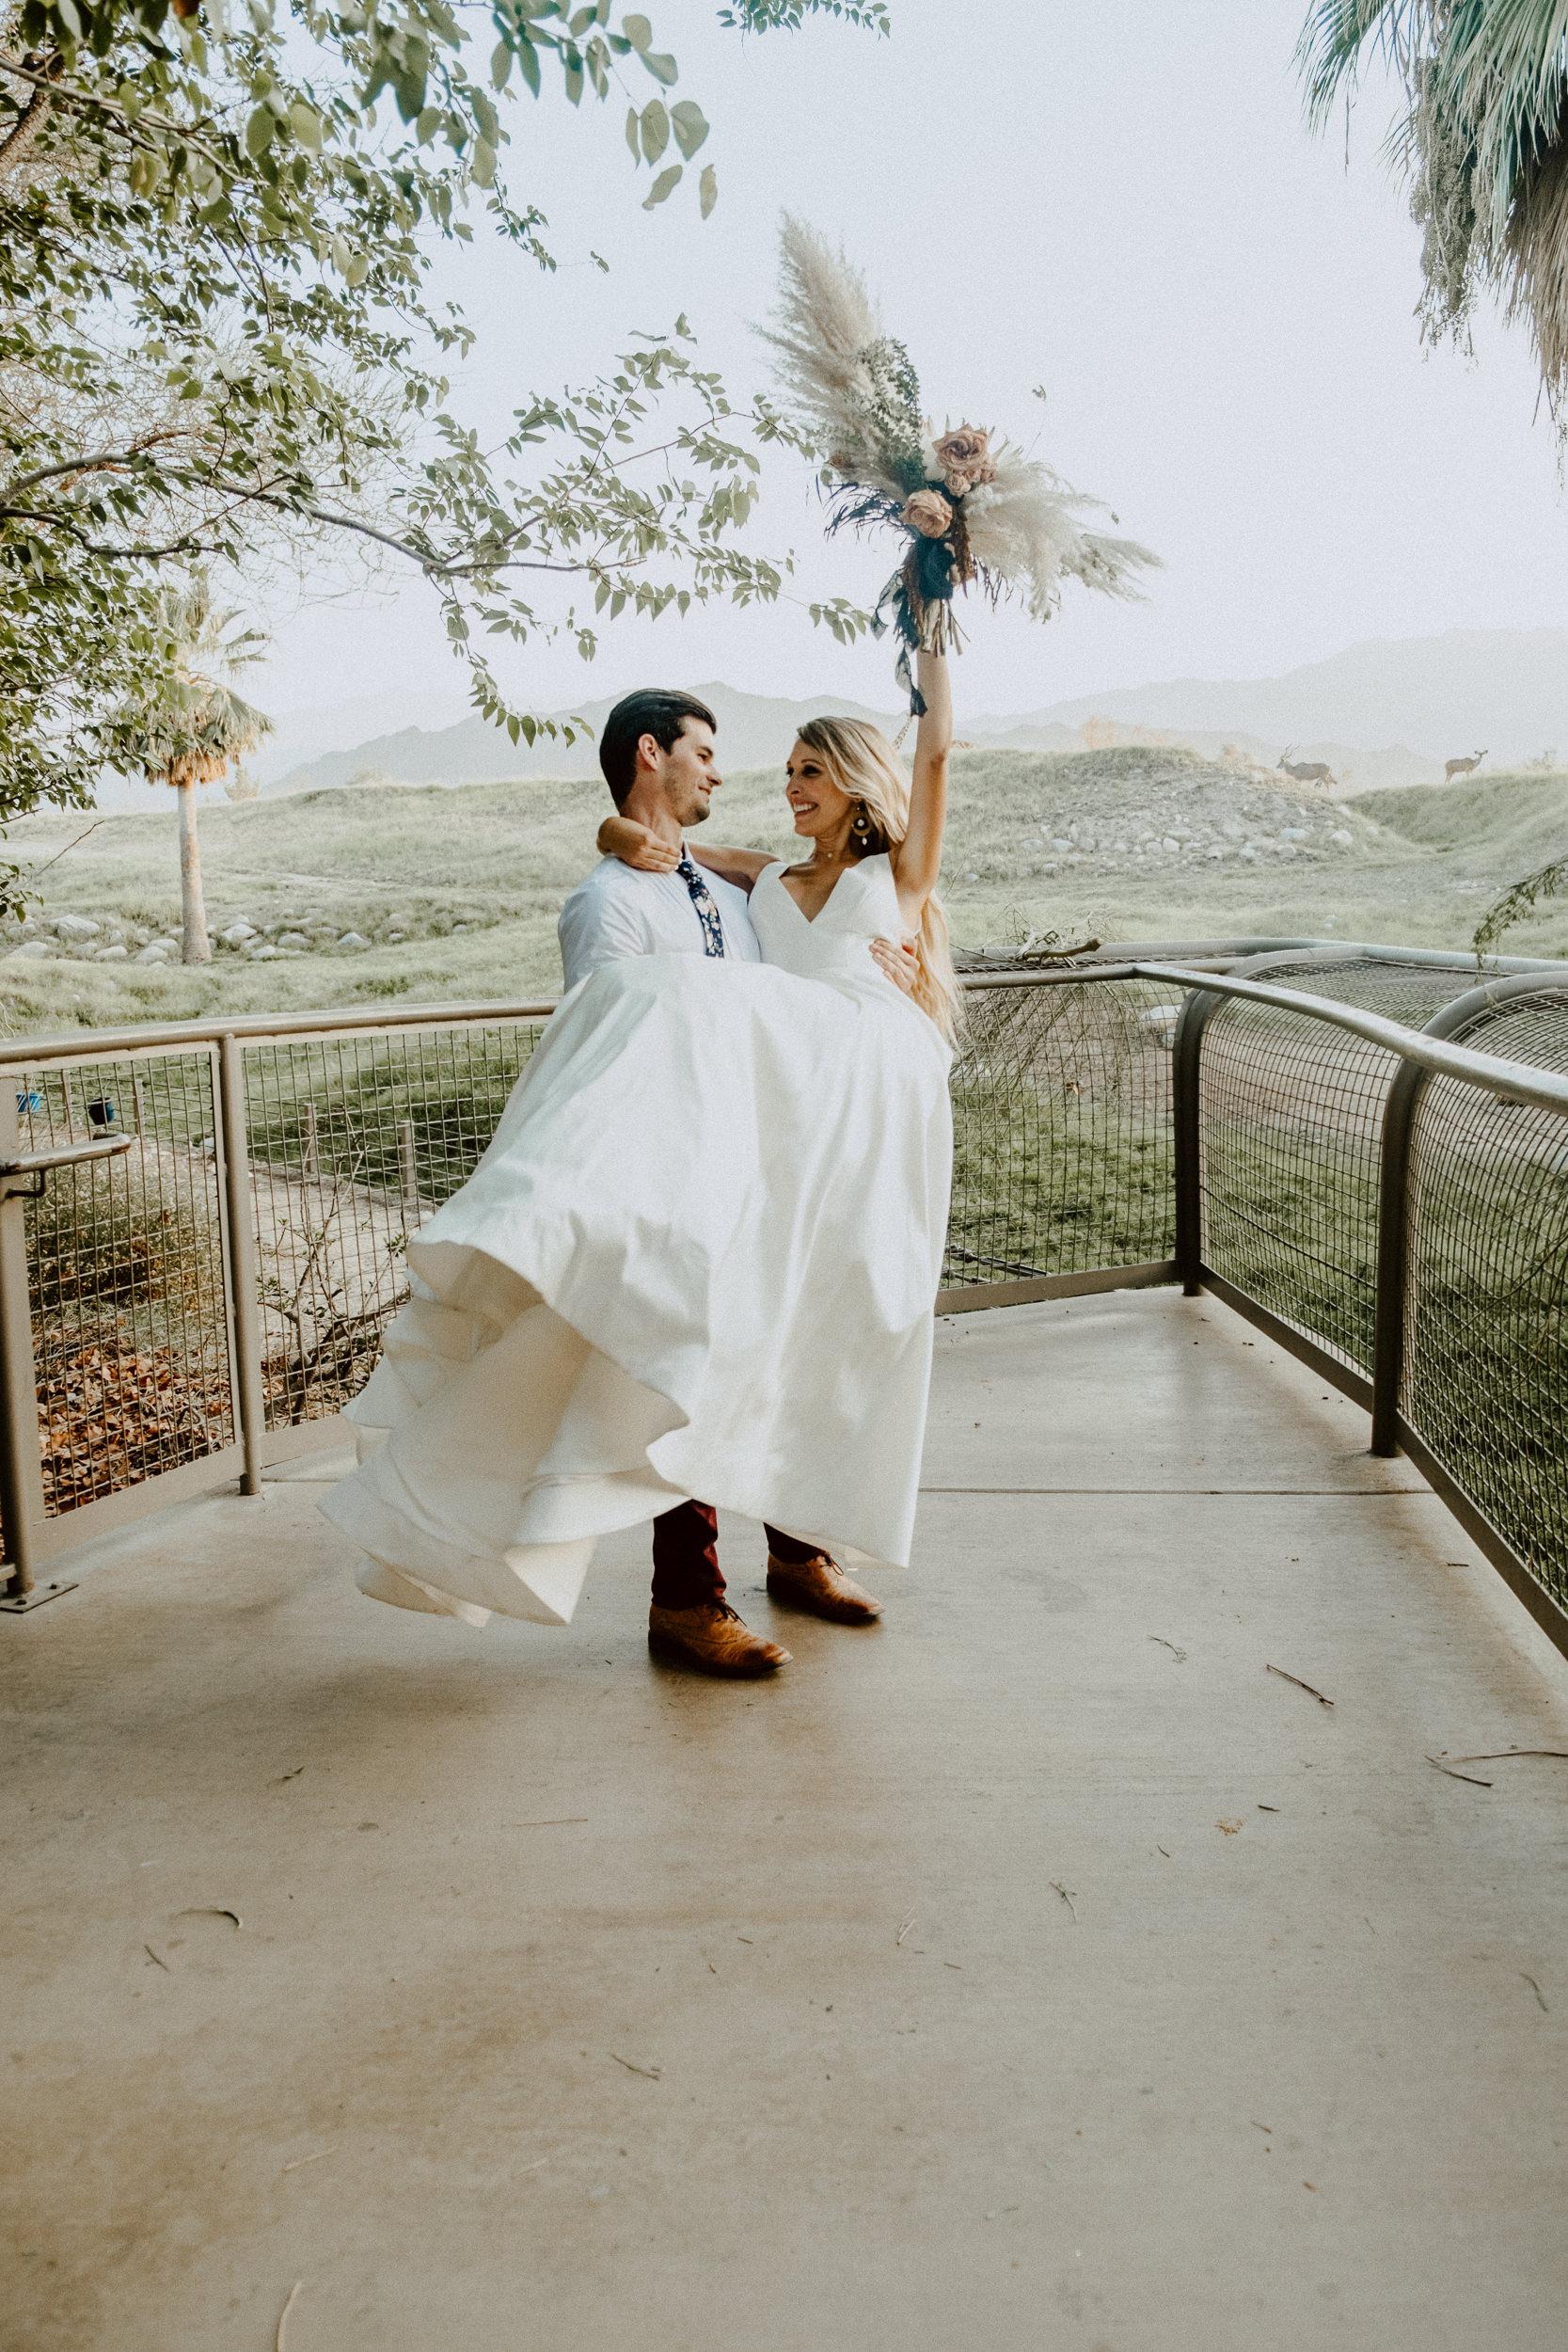 sChelsie + Chris - The Desert Shootout Wedding Romantics at The Living Desert-43.jpg